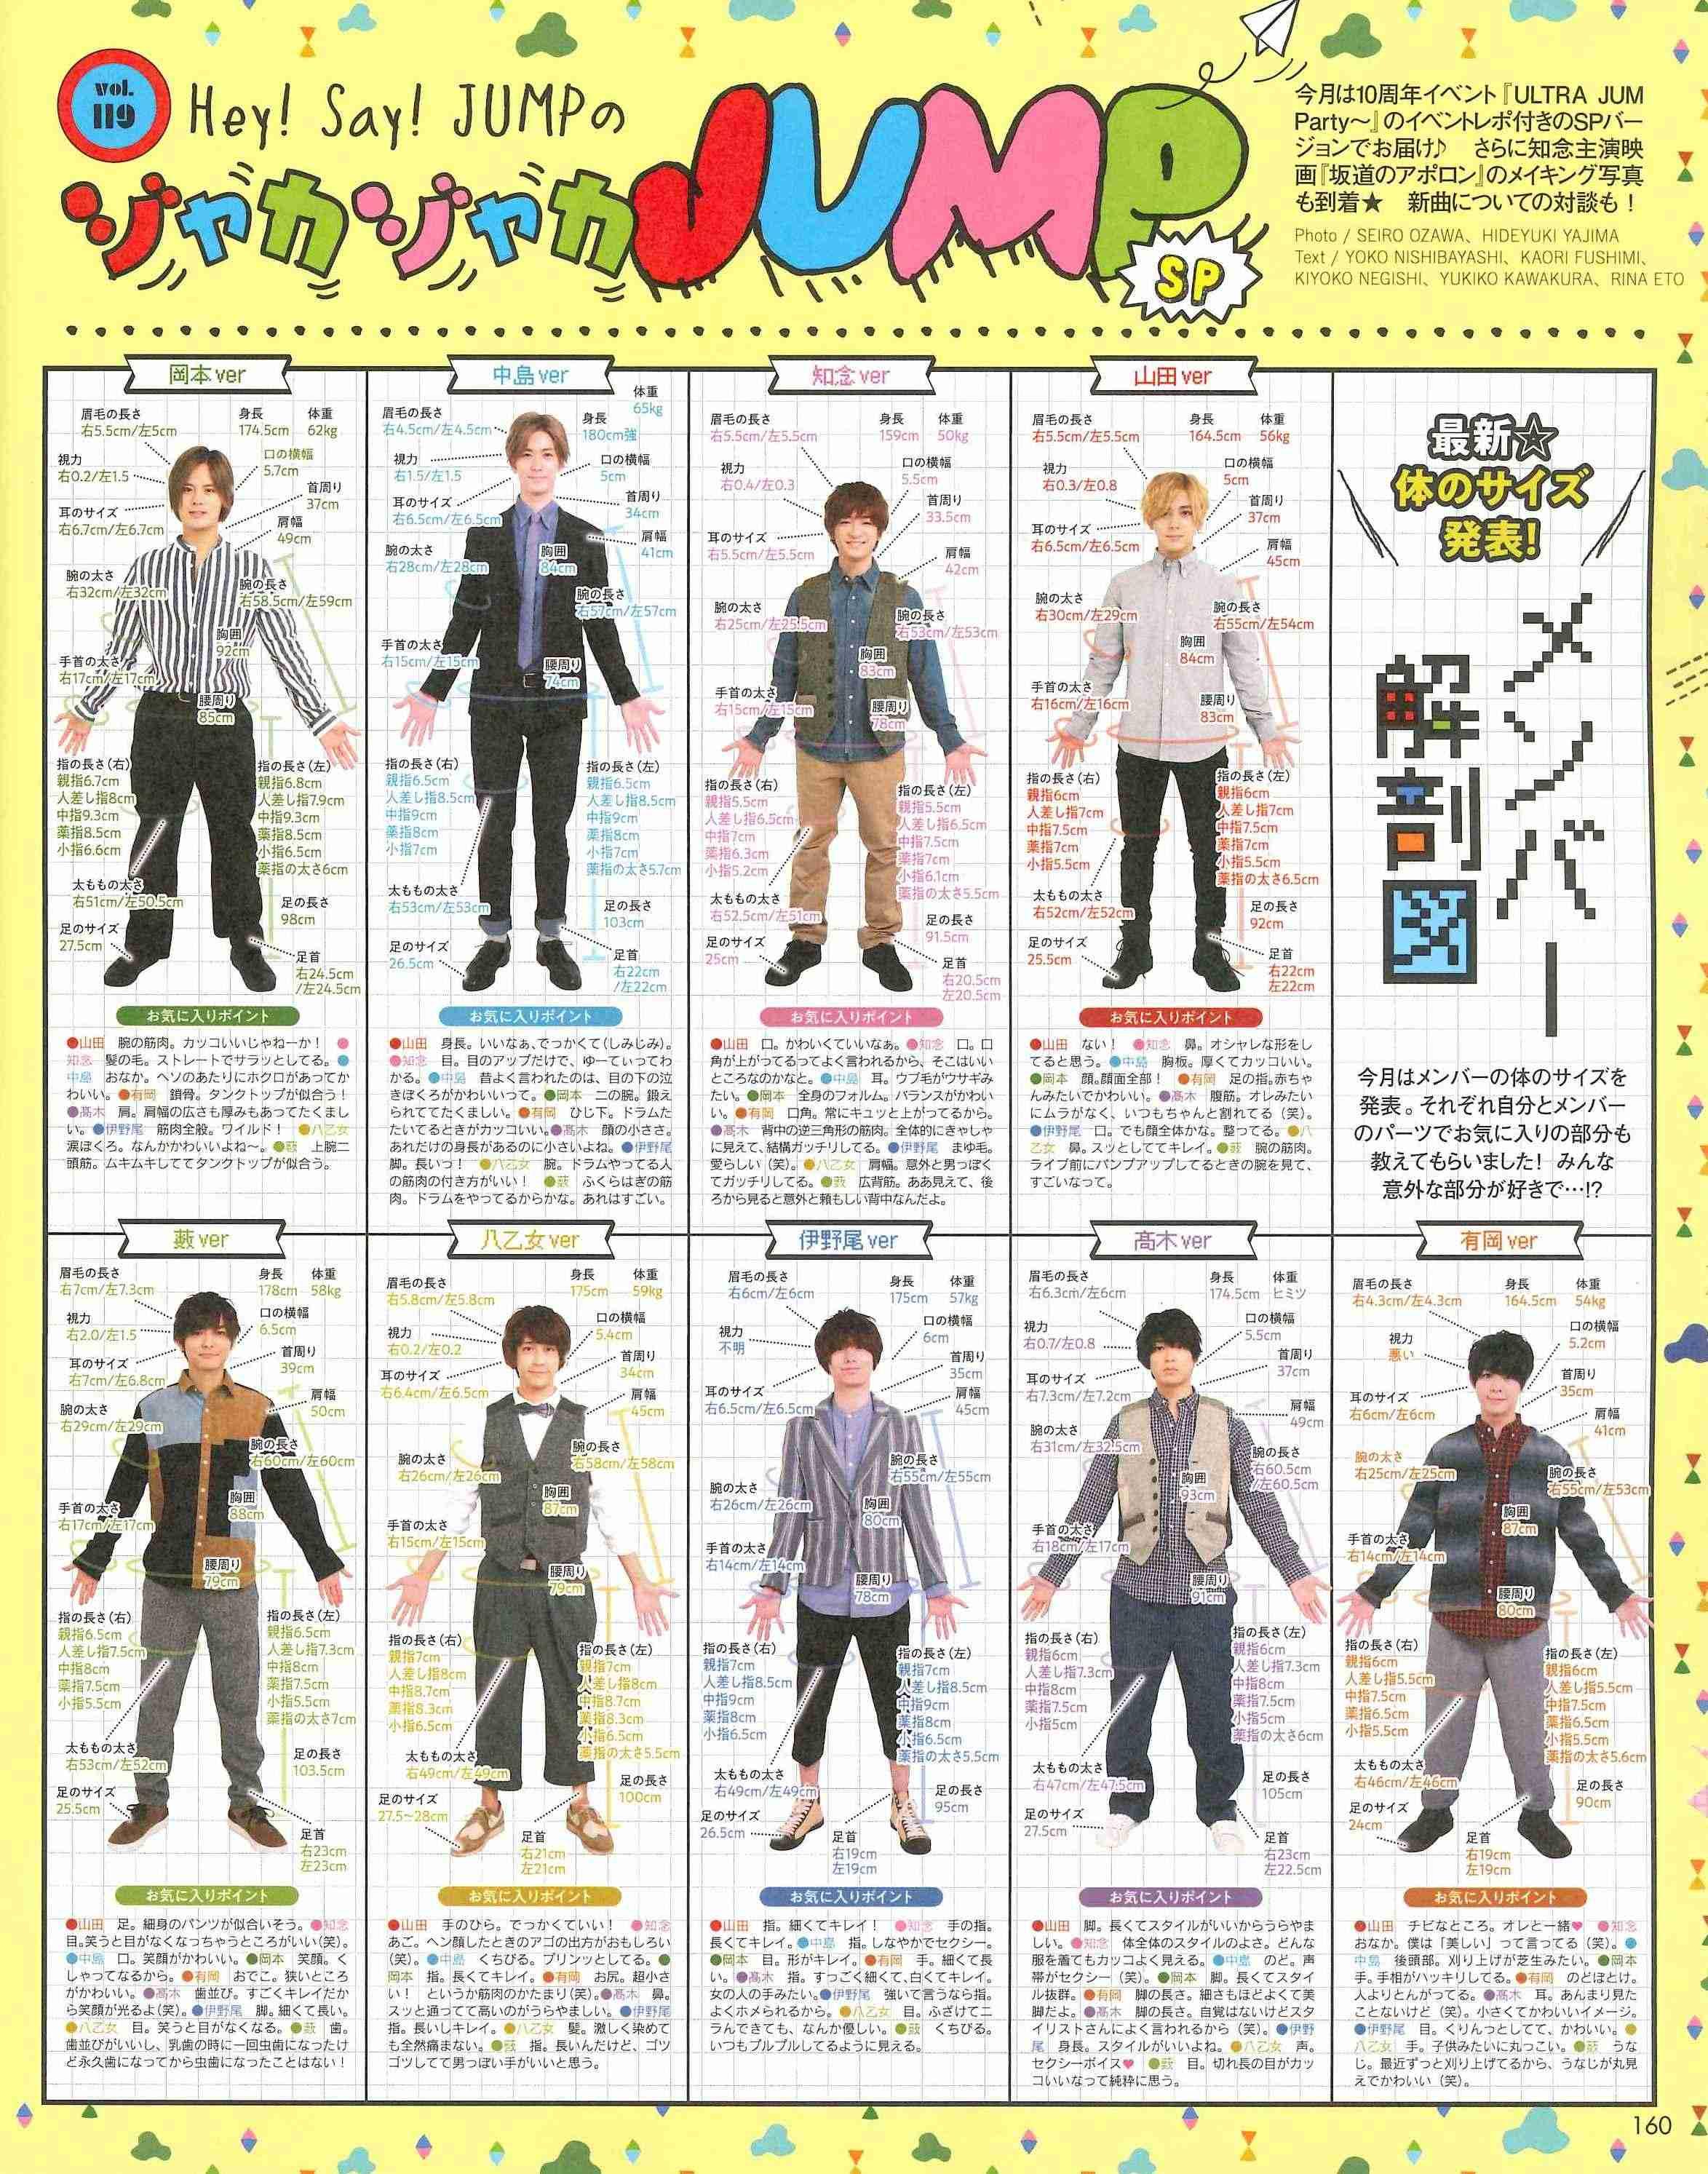 Hey! Say! JUMP山田涼介、身長164cmで仕事に不安